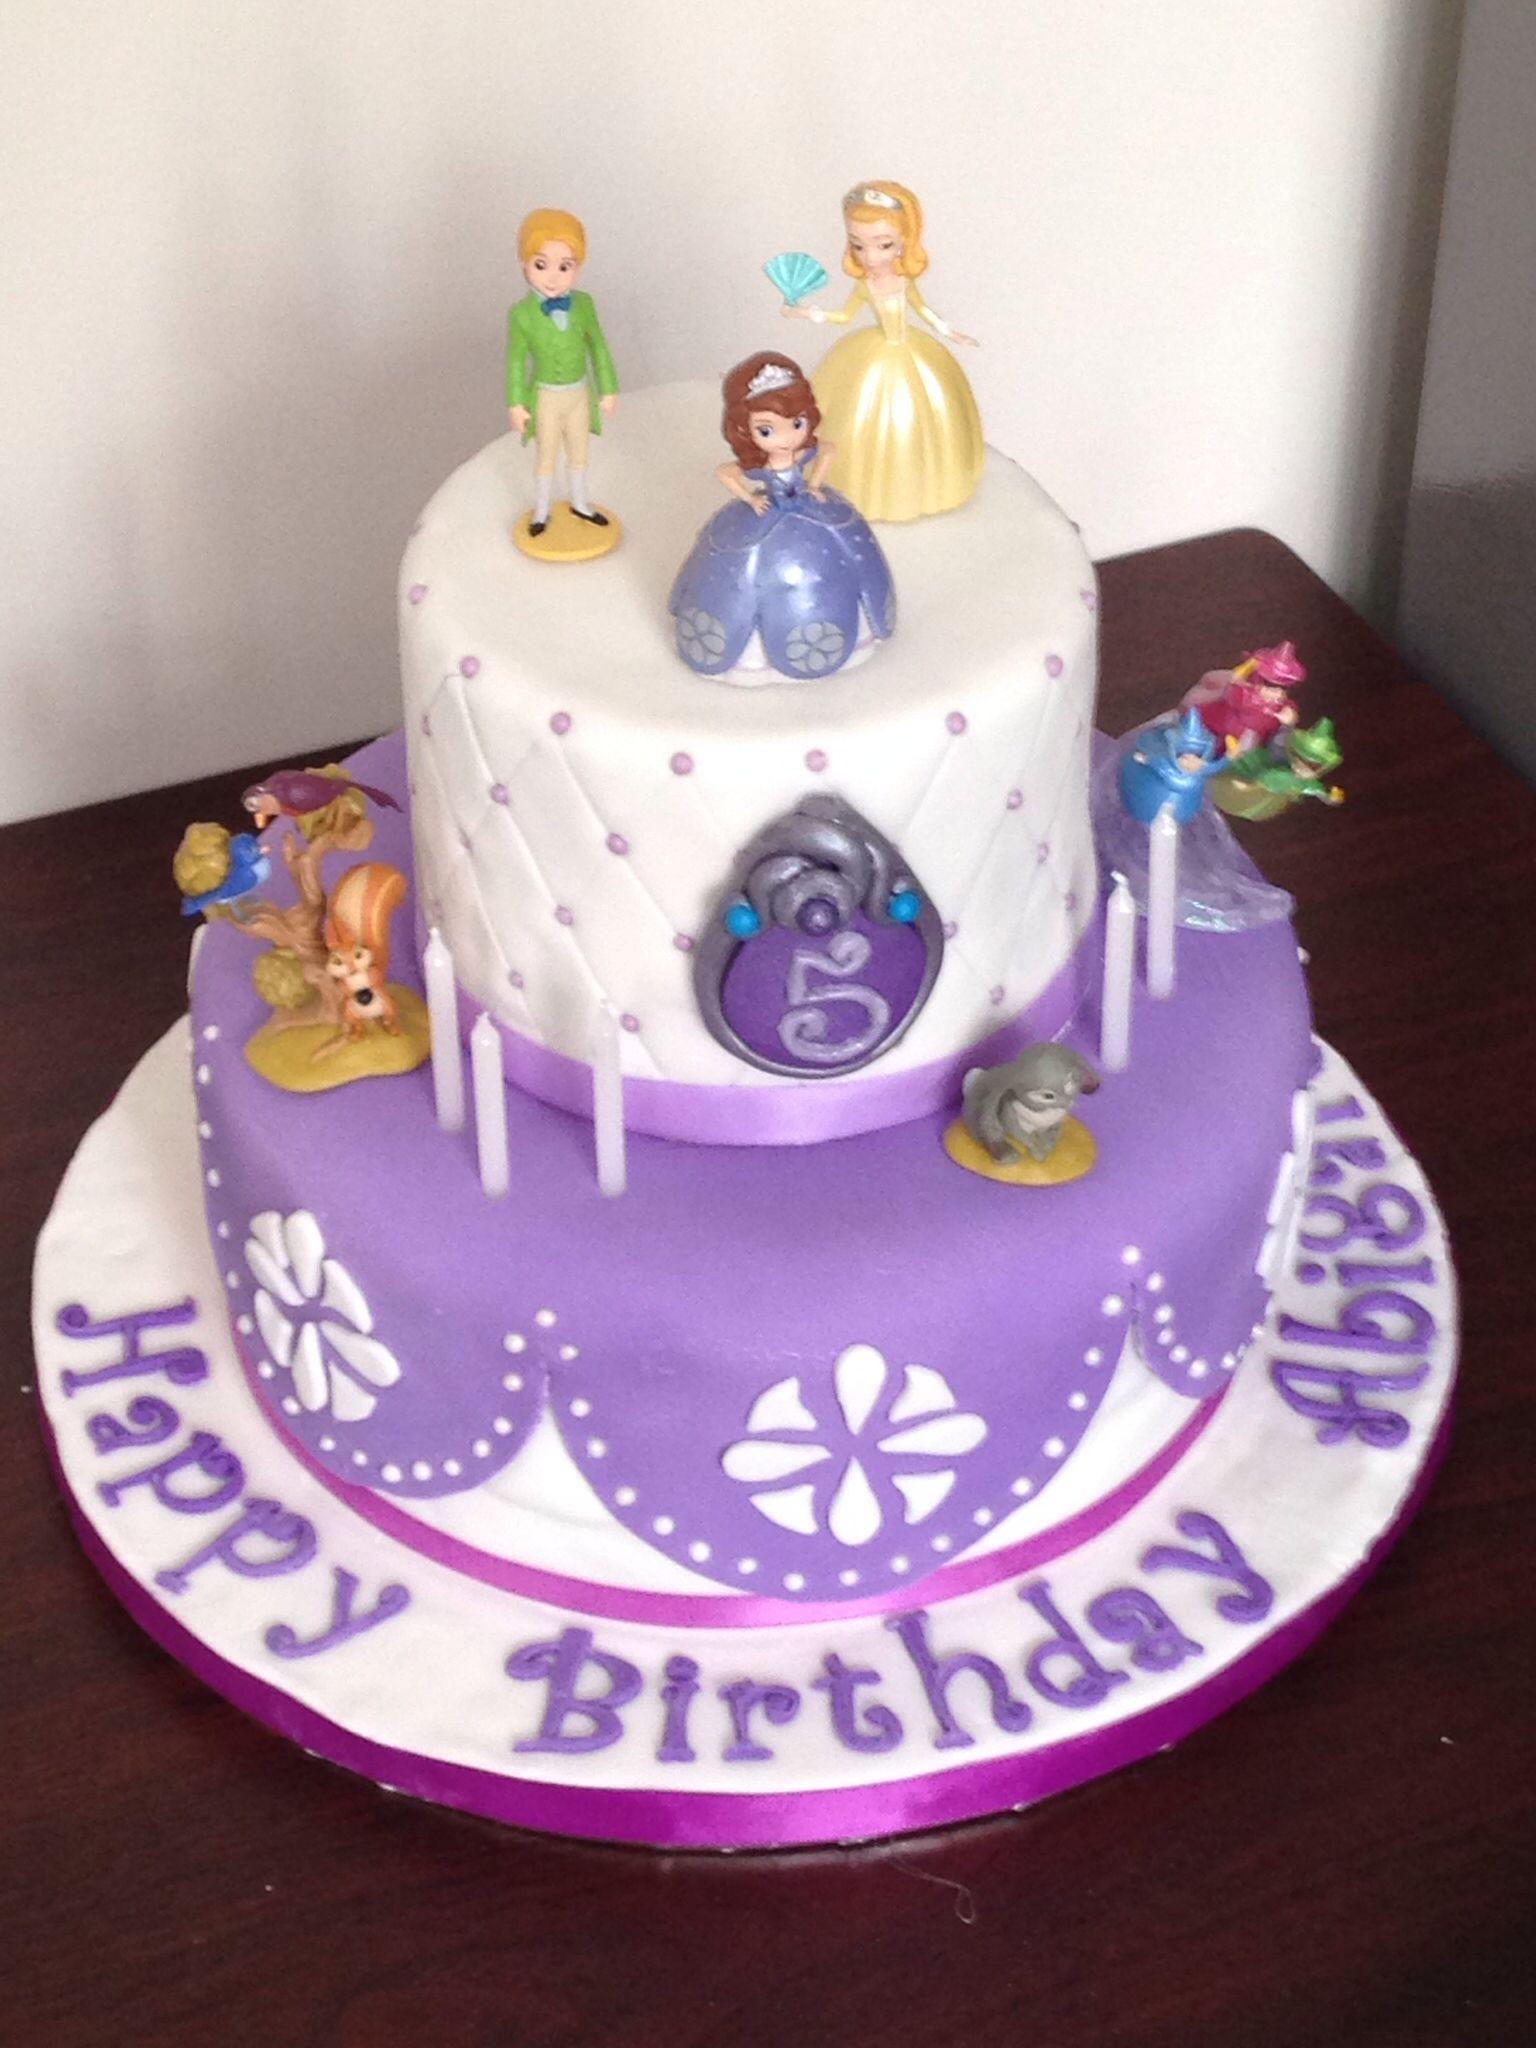 Sofia The First Birthday Cake Ideas Cumple Luci 2015 Pinterest